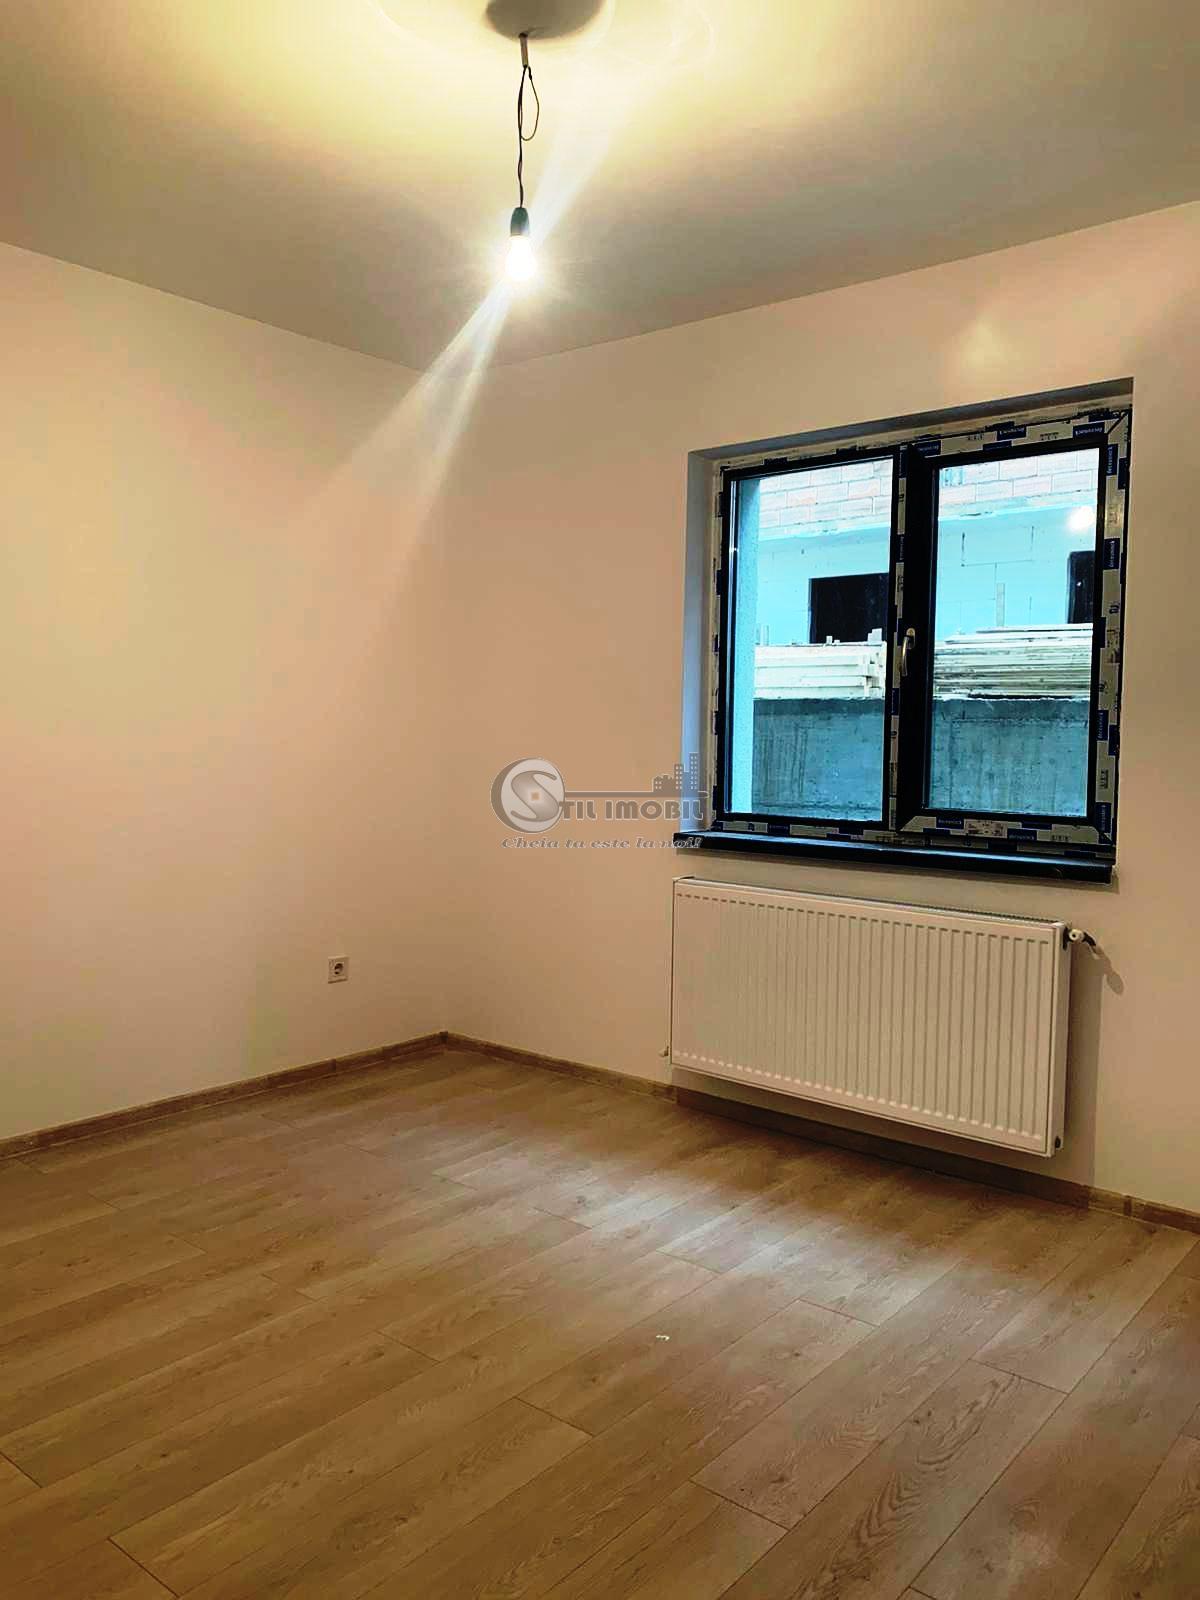 OFERTA! Apartament 1 camera, Popas Pacurari -Mutare imediata